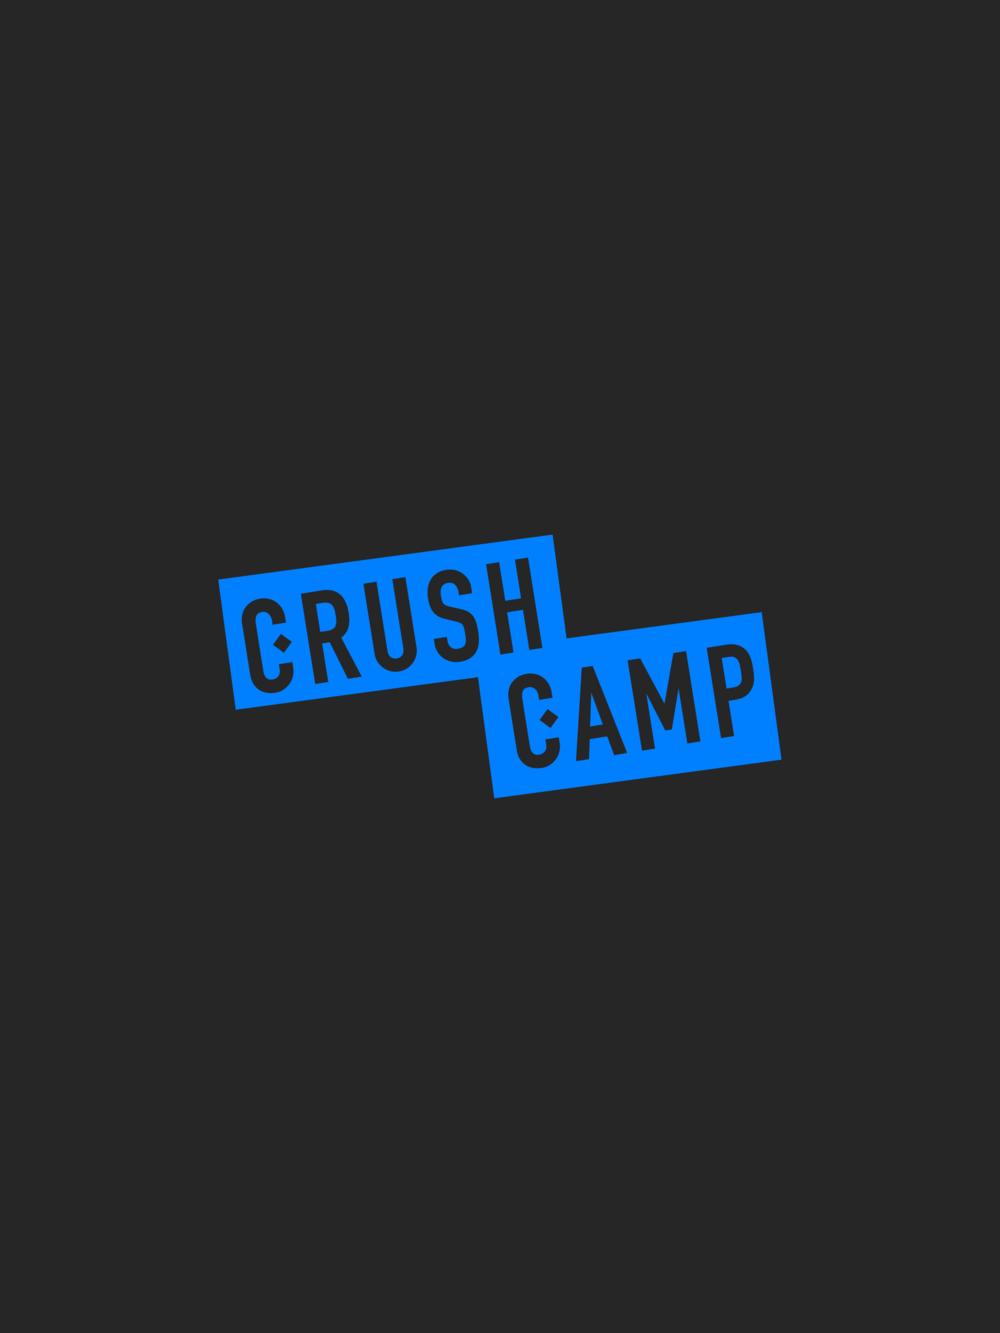 CrushCamp Logo | Trout + Taylor www.troutandtaylor.com